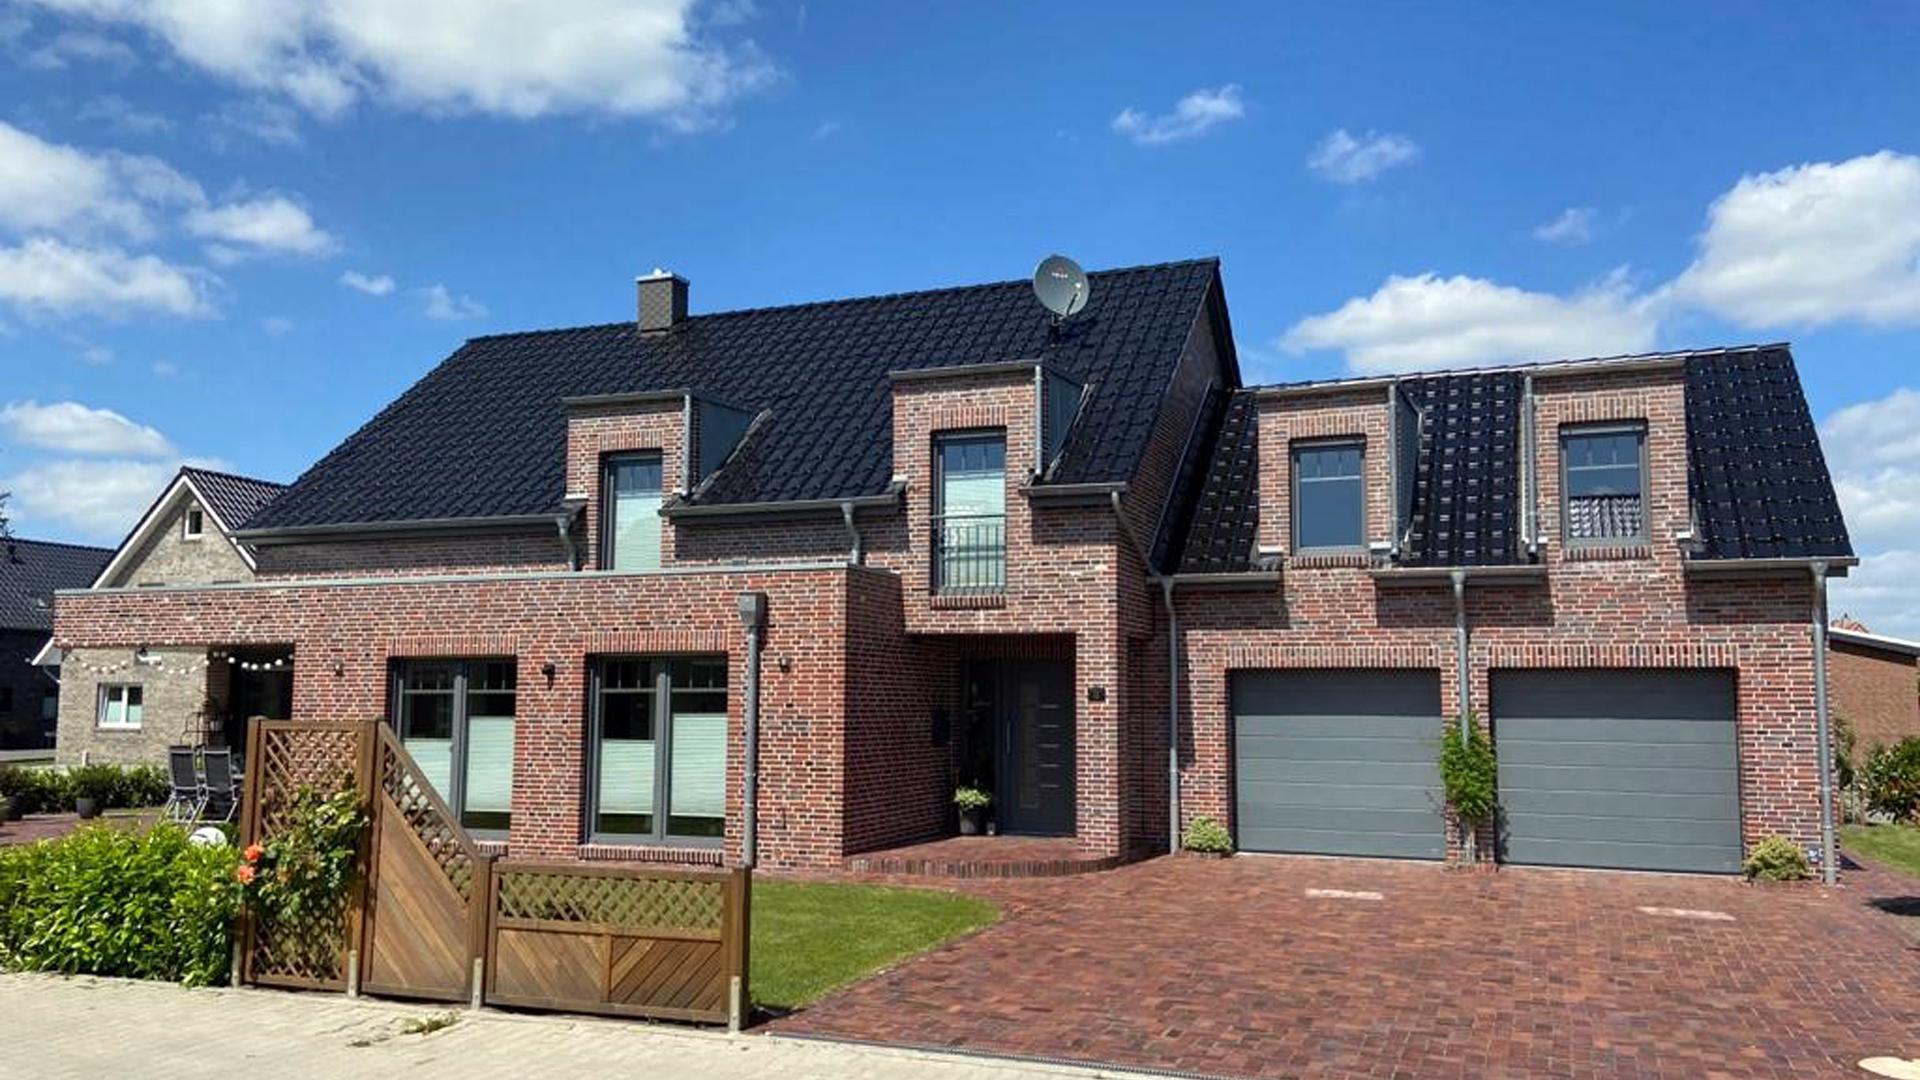 Neubau - Einfamilienhaus - Papenburg - 2018/2019